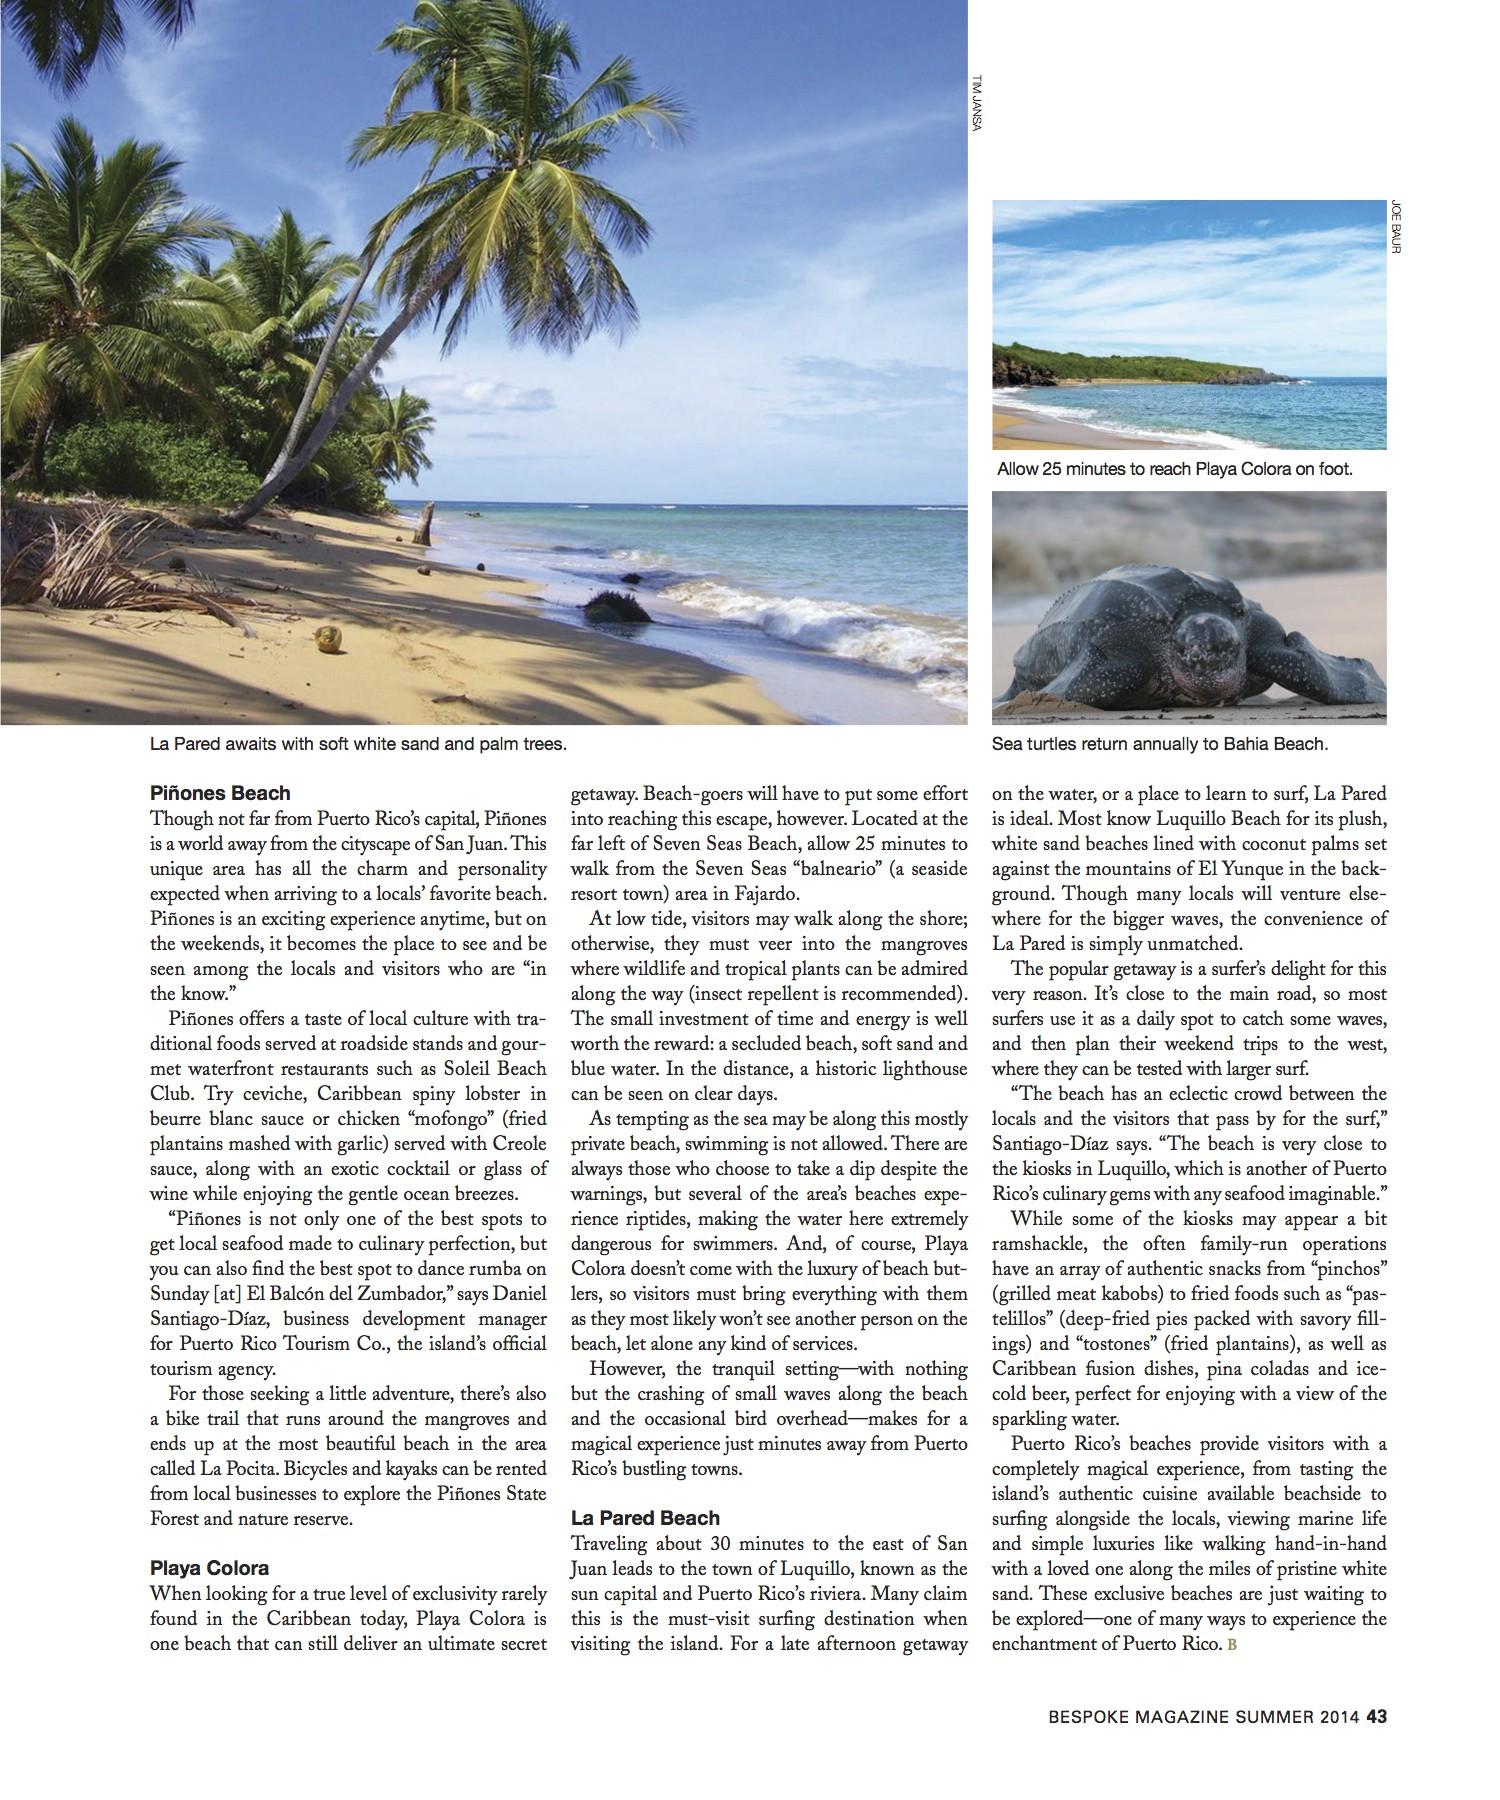 Bespoke_BahiaBeach_Summer14_3